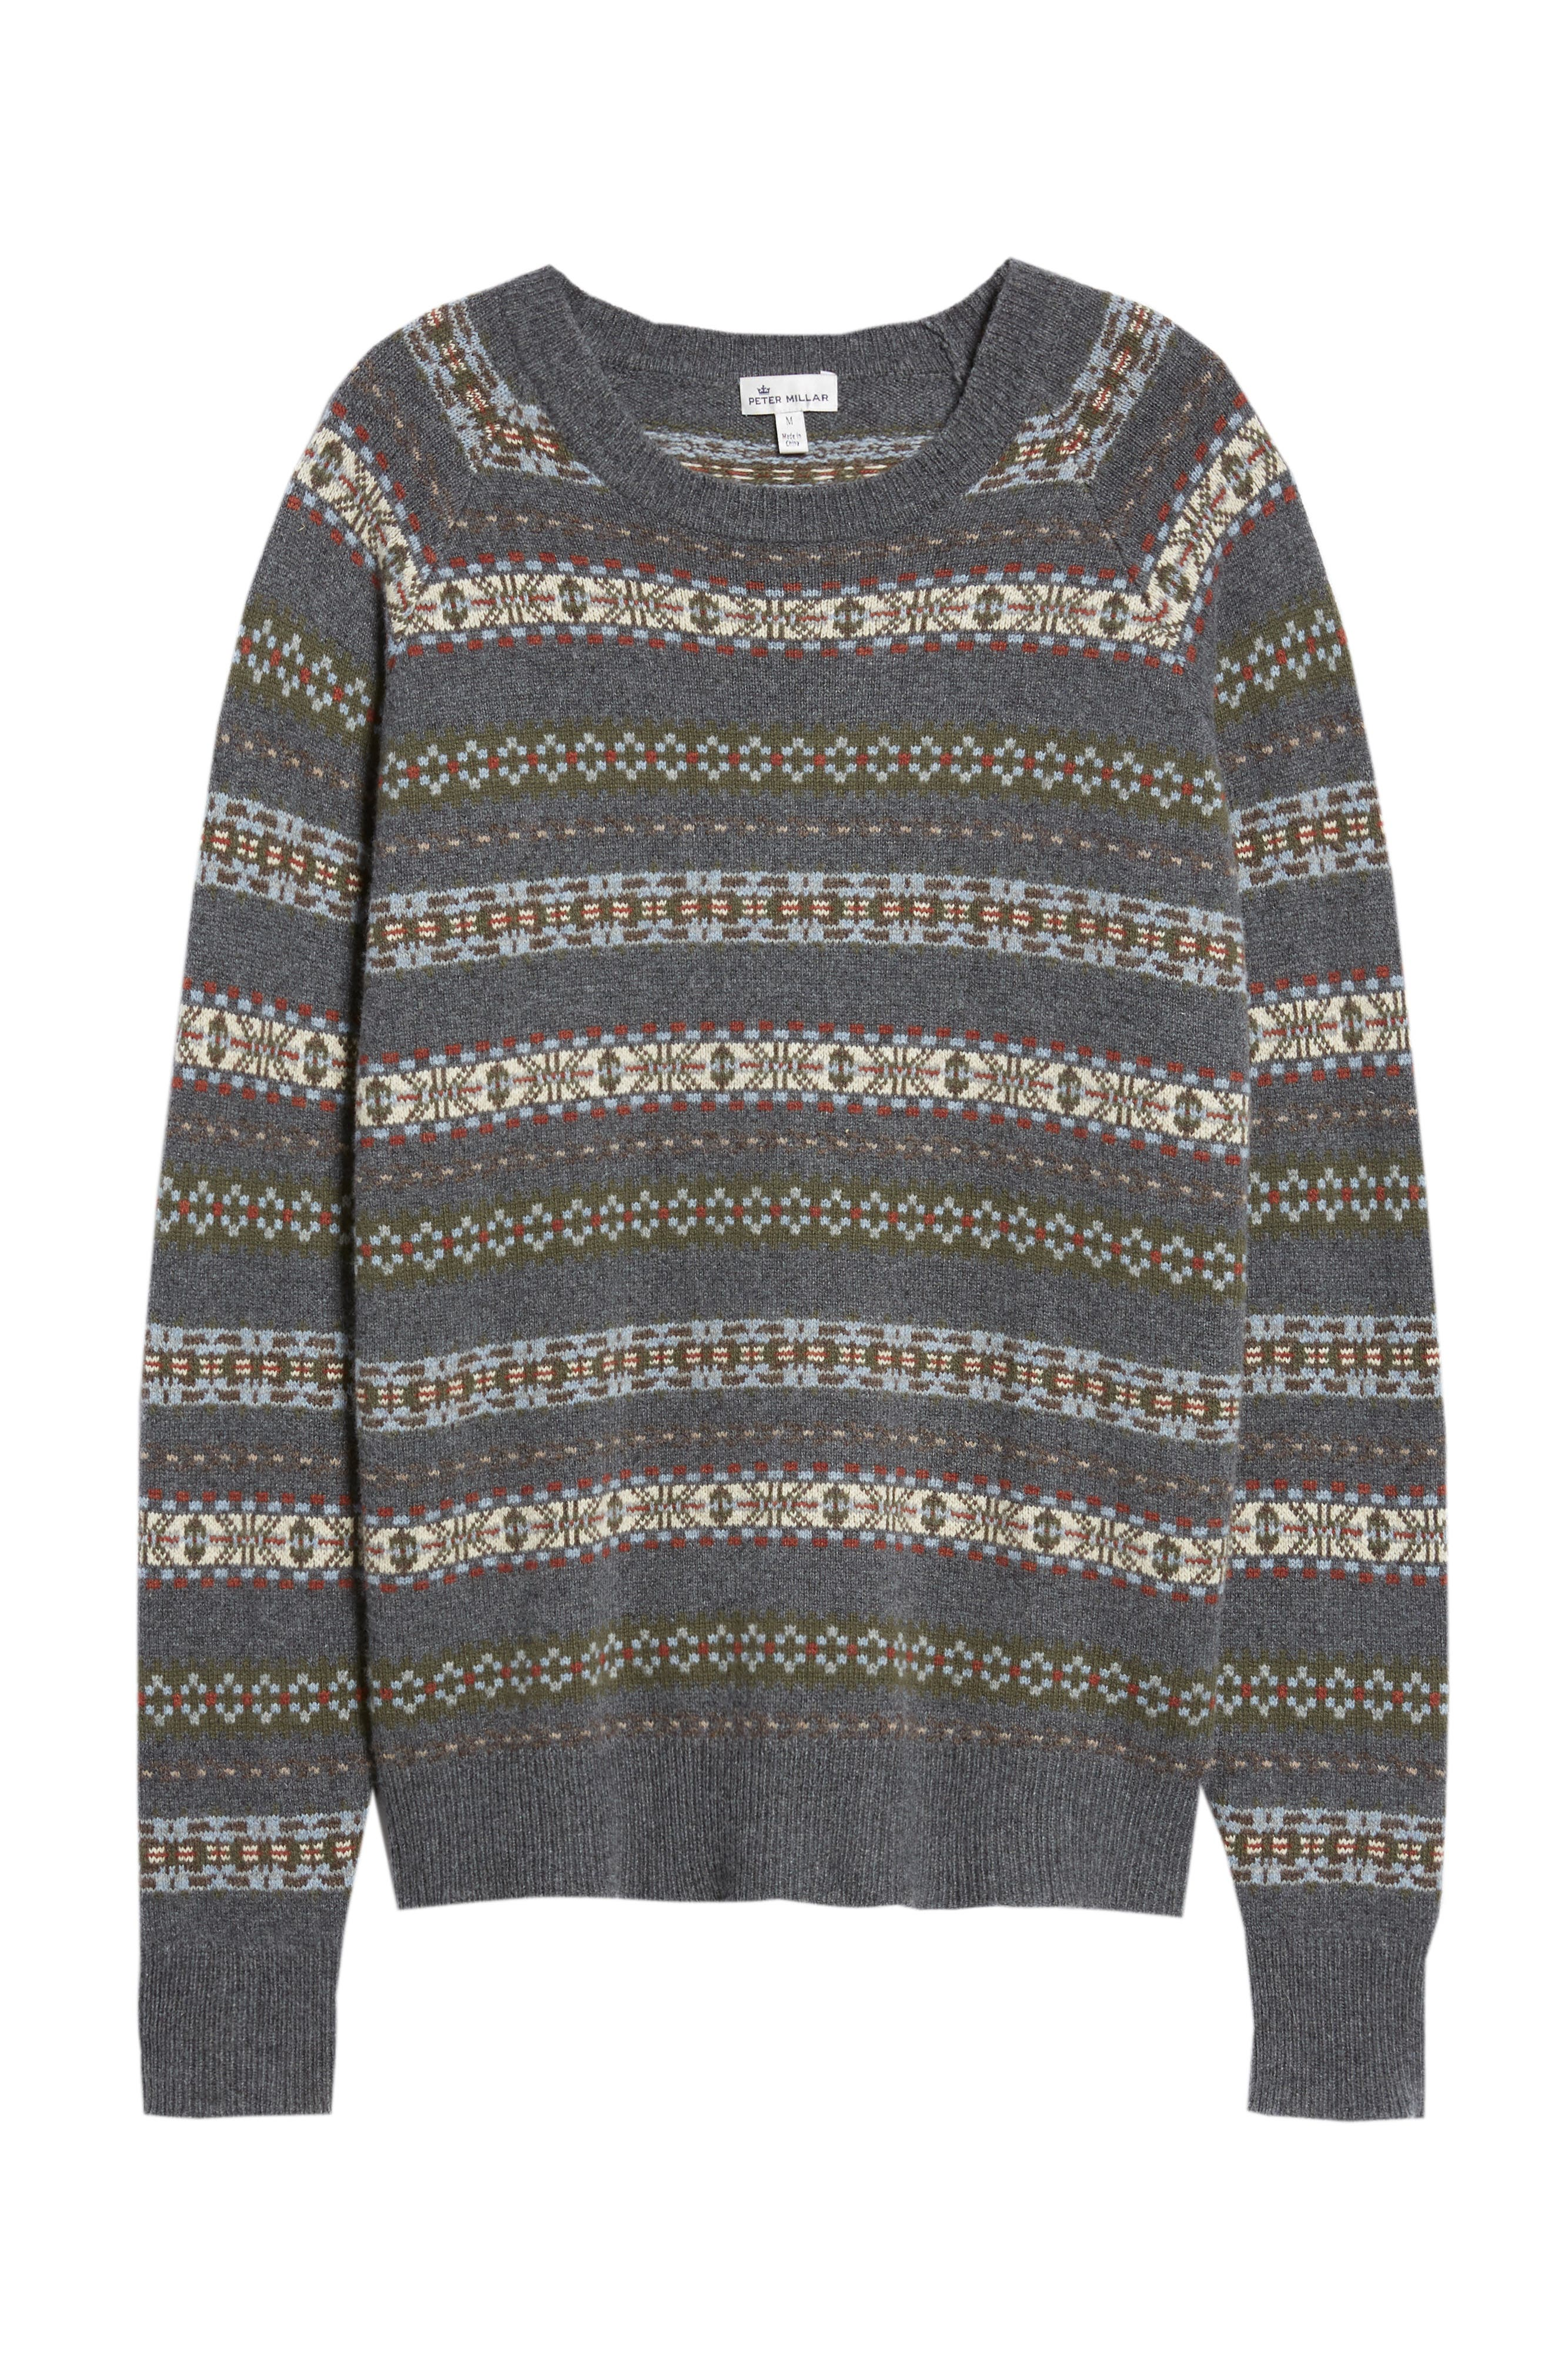 PETER MILLAR,                             Mountainside Fair Isle Crewneck Sweater,                             Alternate thumbnail 6, color,                             BLACK